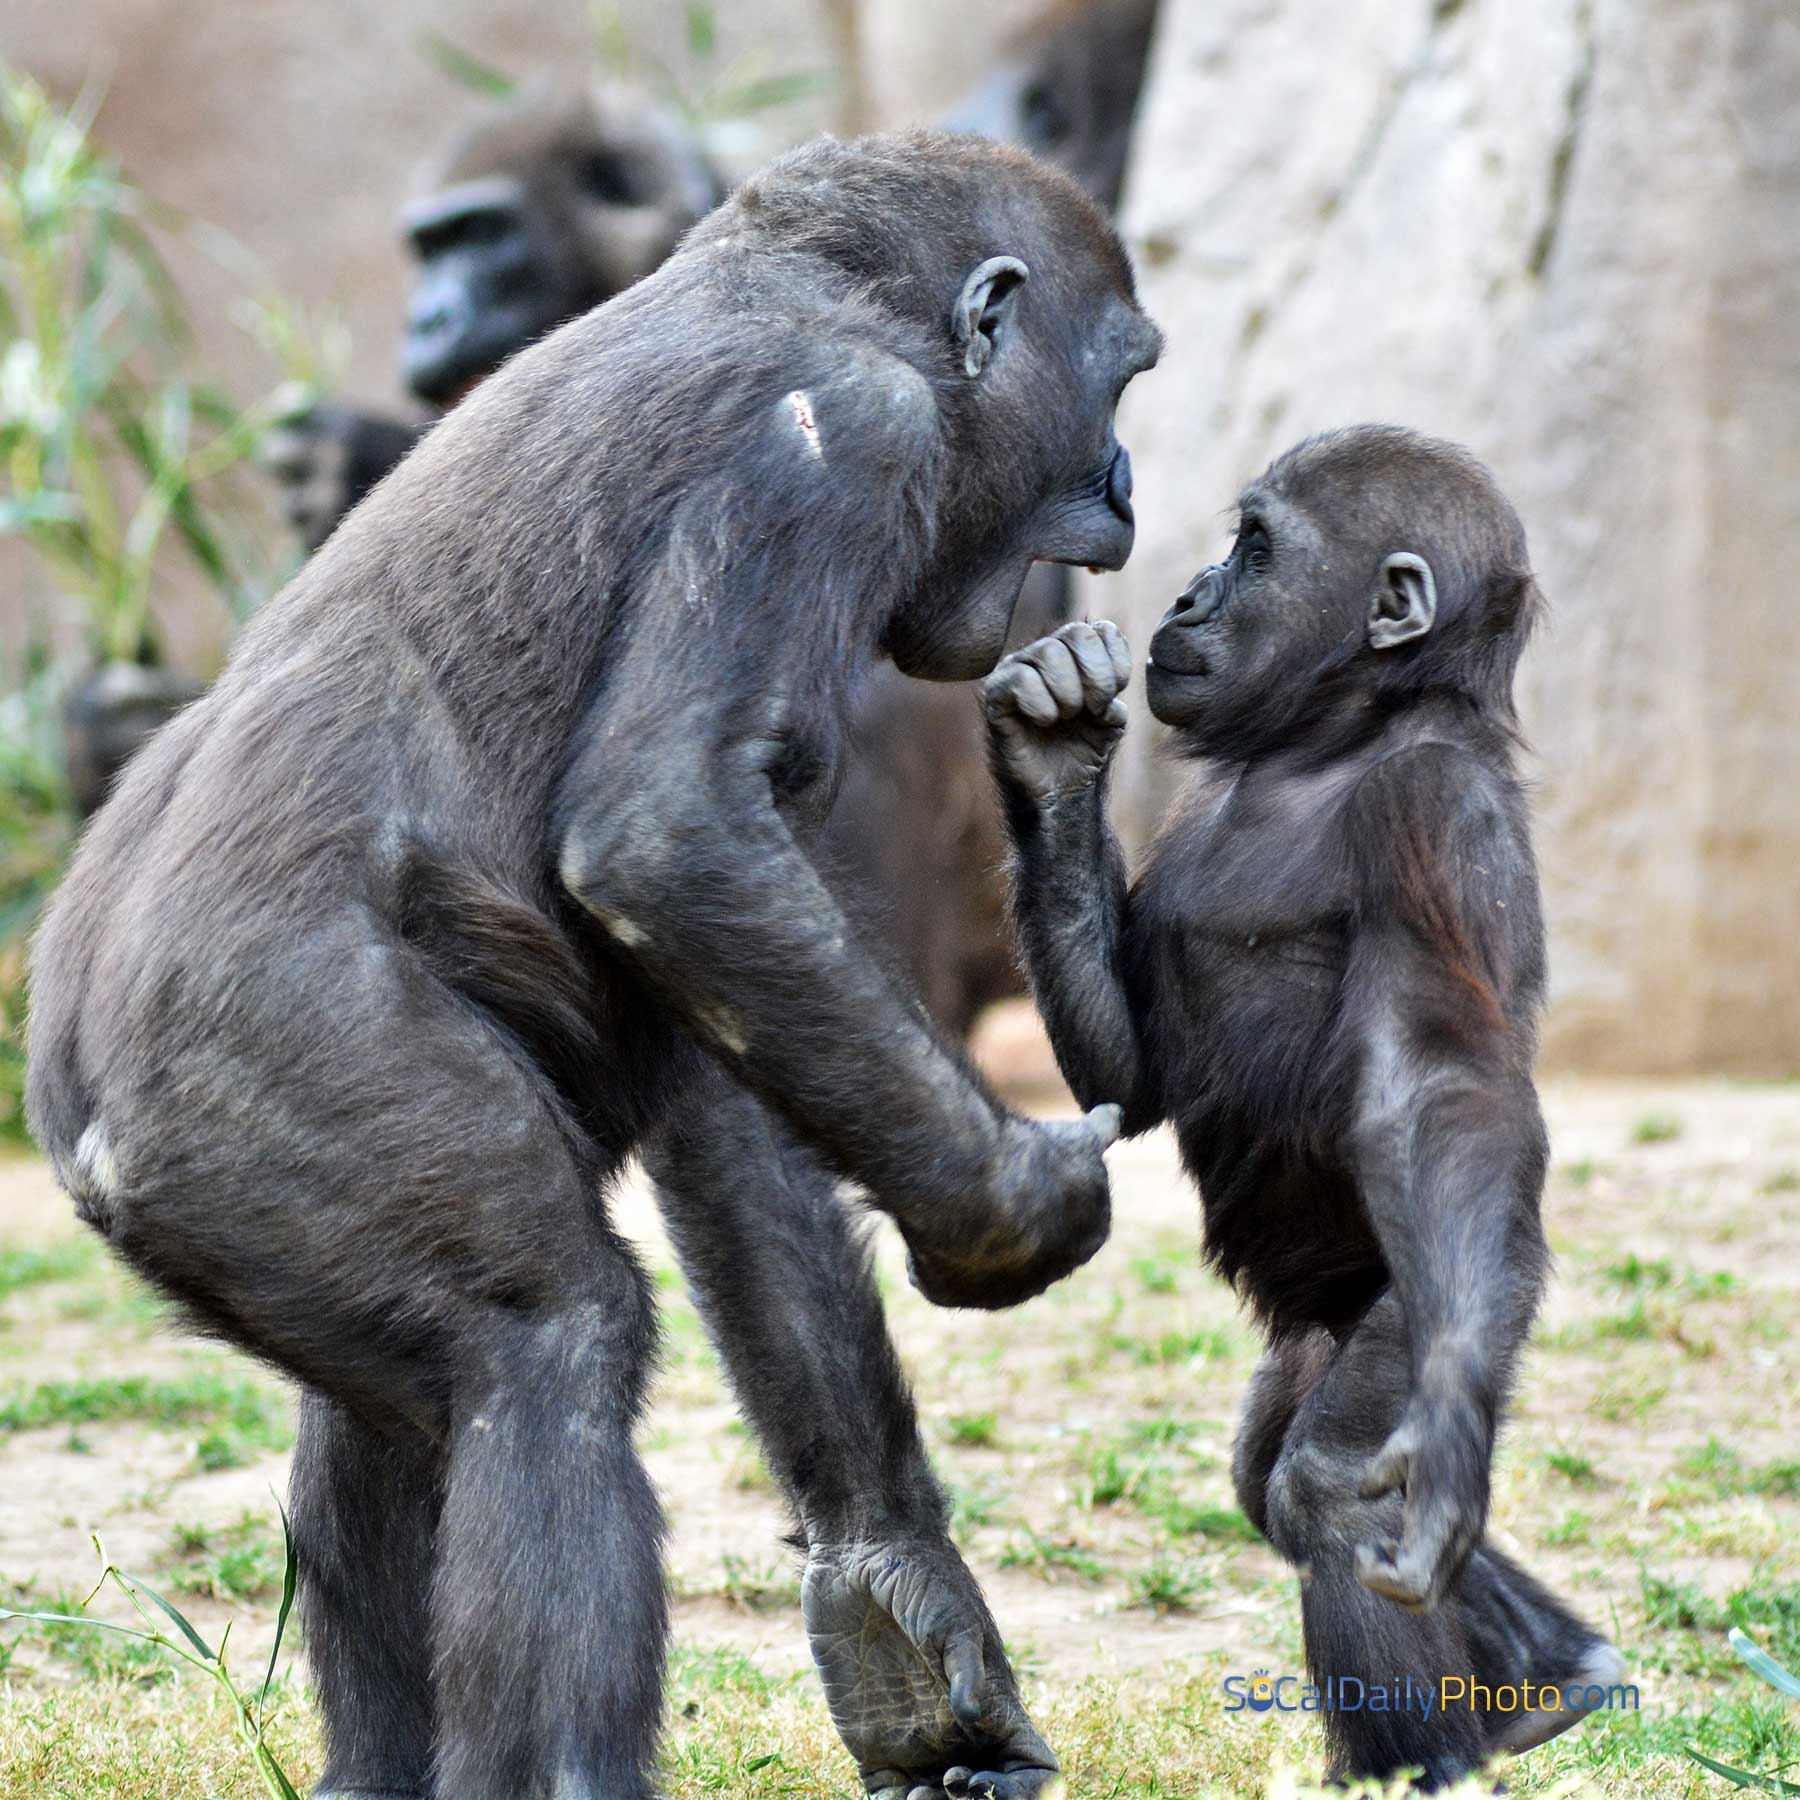 Baby Gorilla at the San Diego Zoo Safari Park | Southern